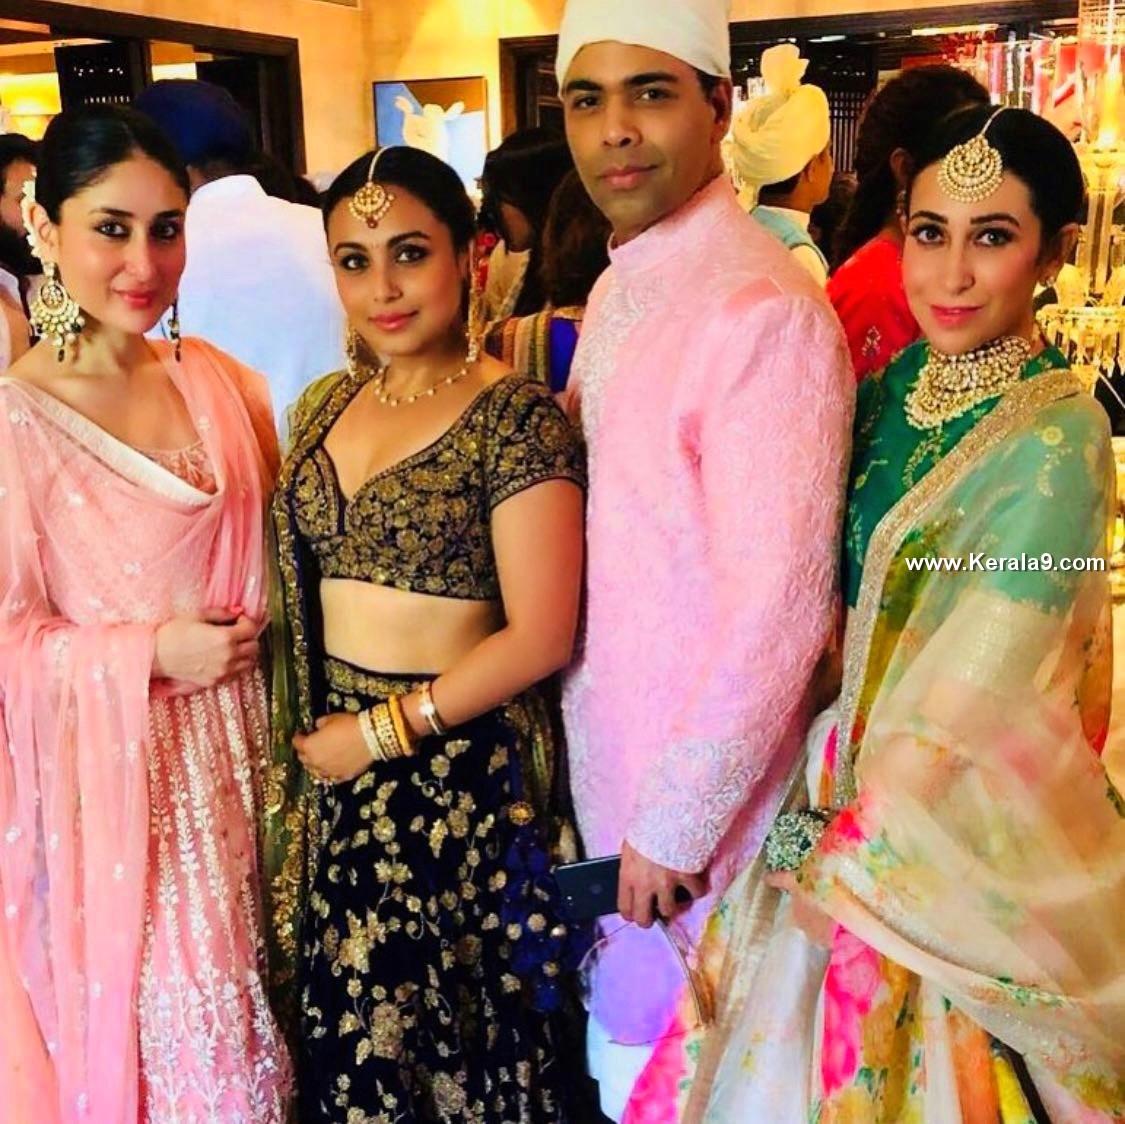 sonam kapoor wedding pics 093221 2